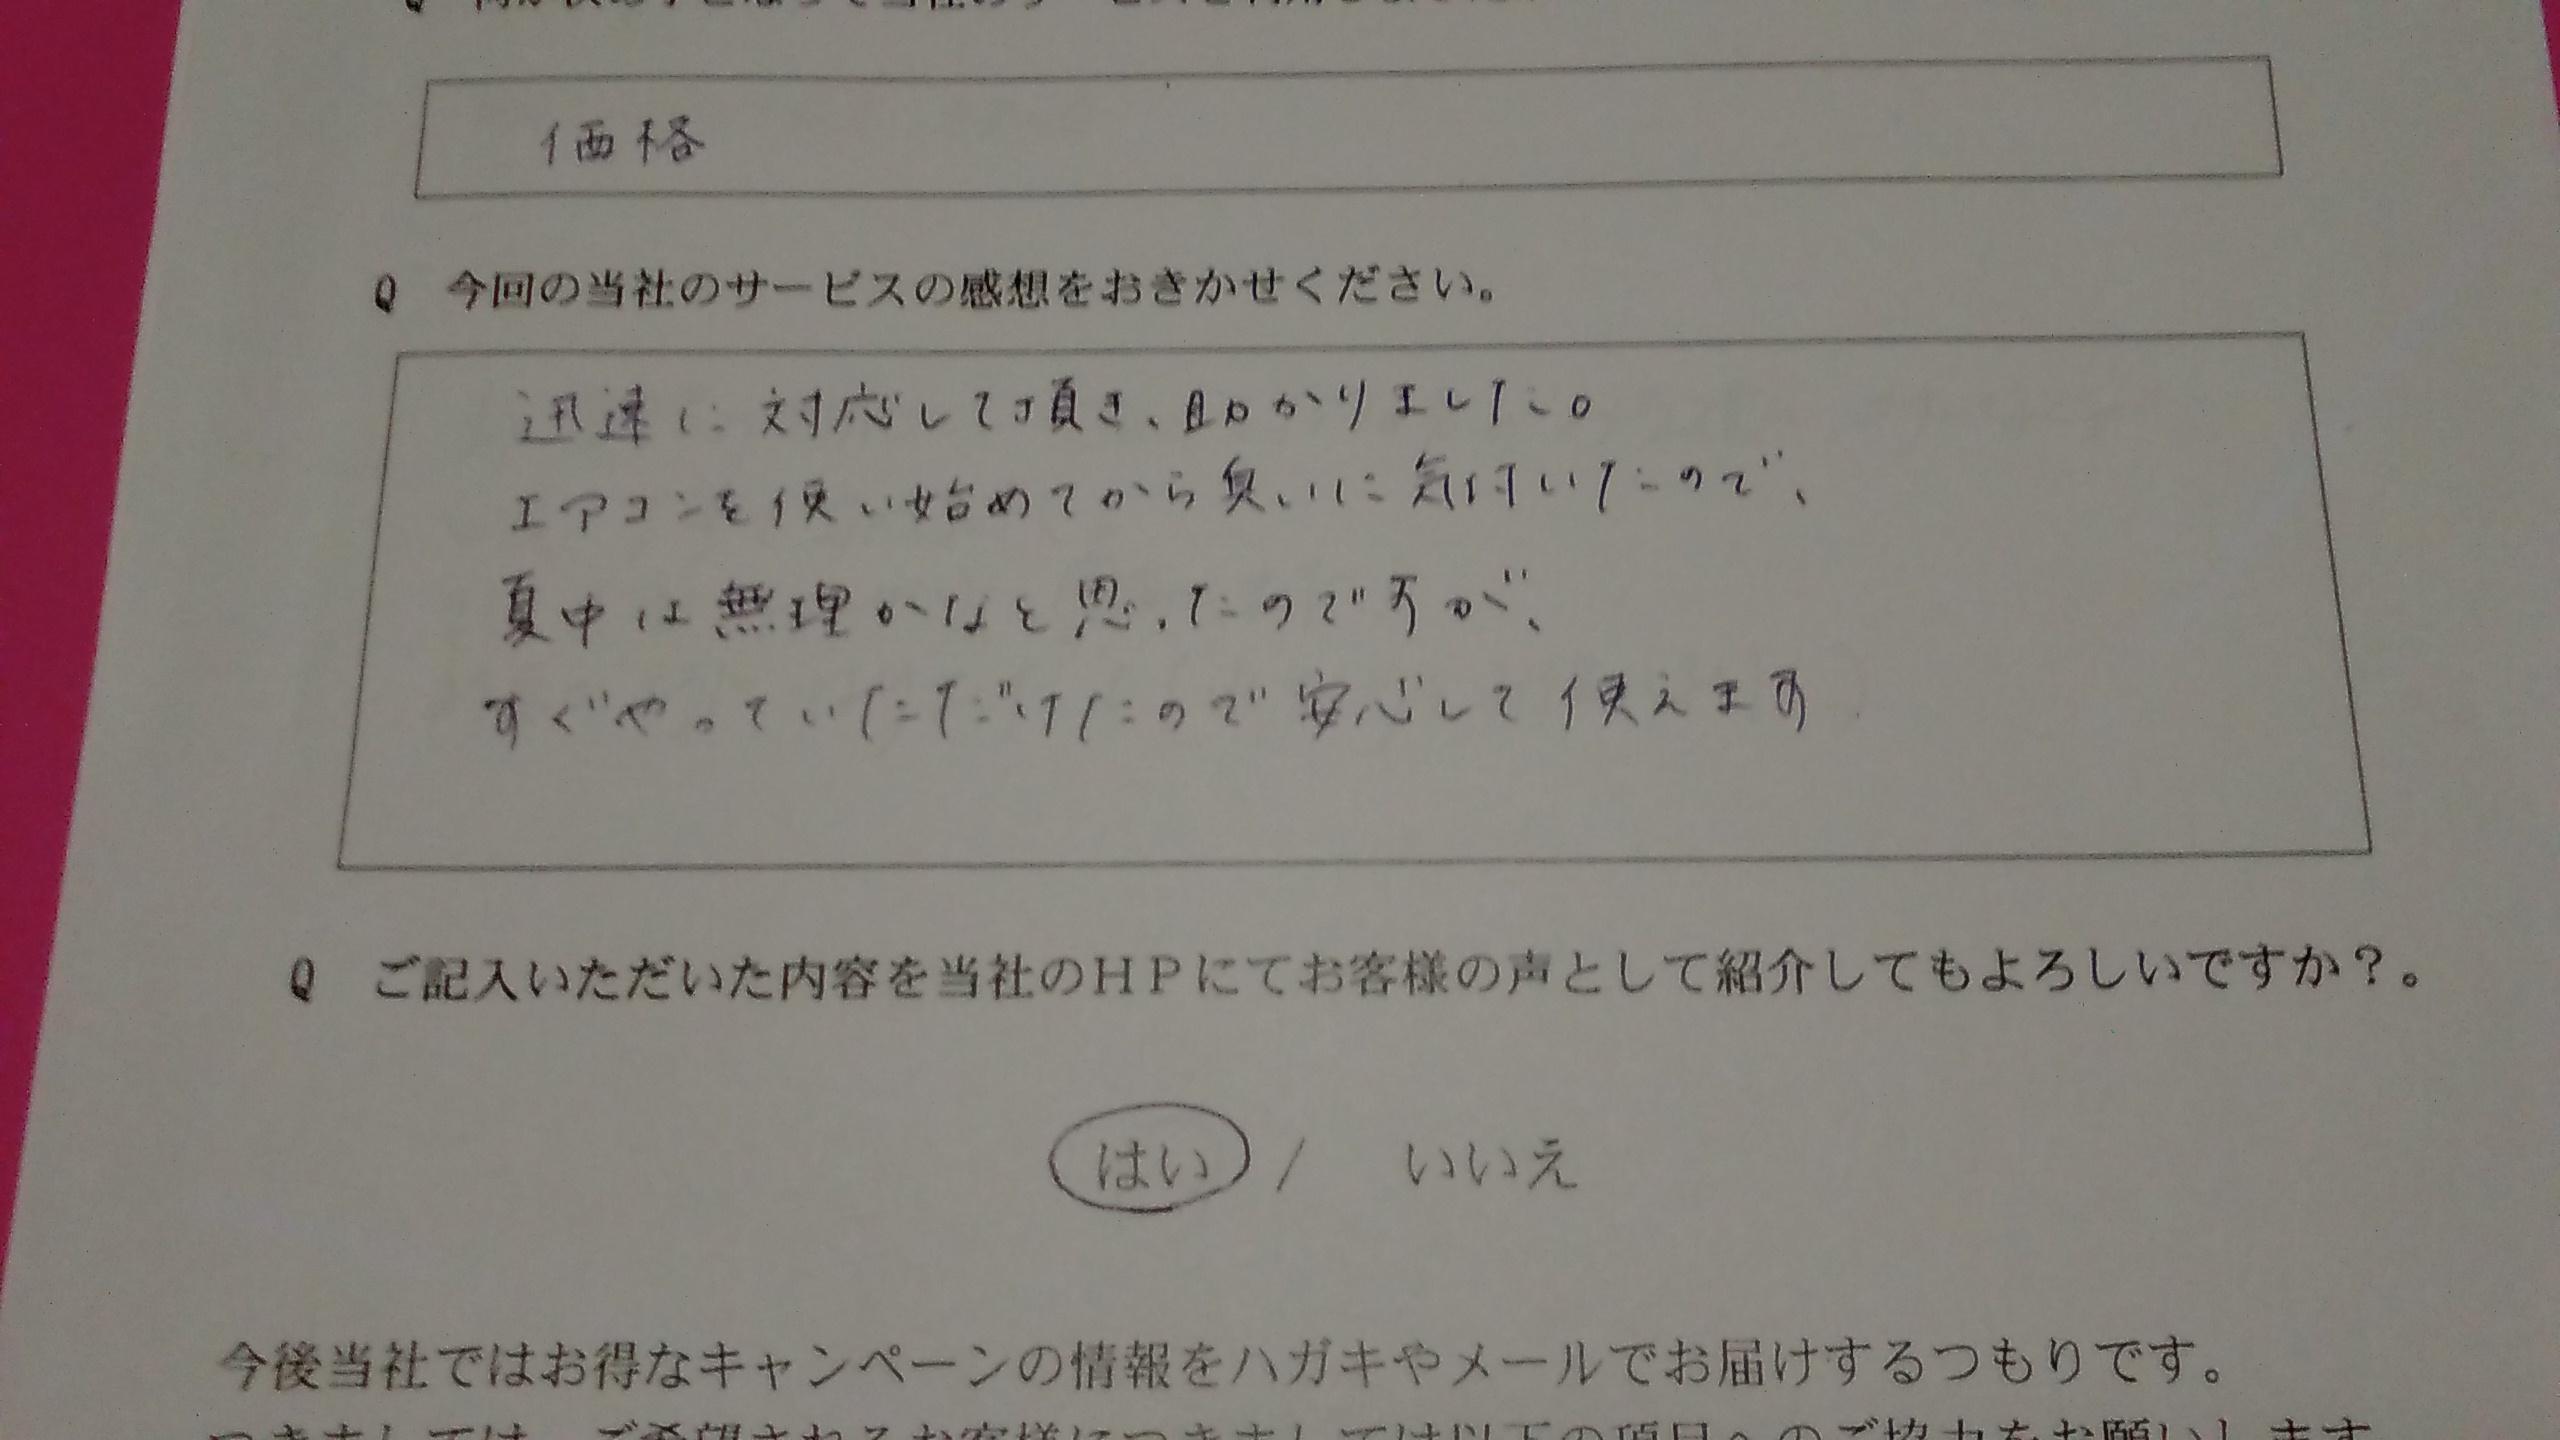 KIMG0023.JPG